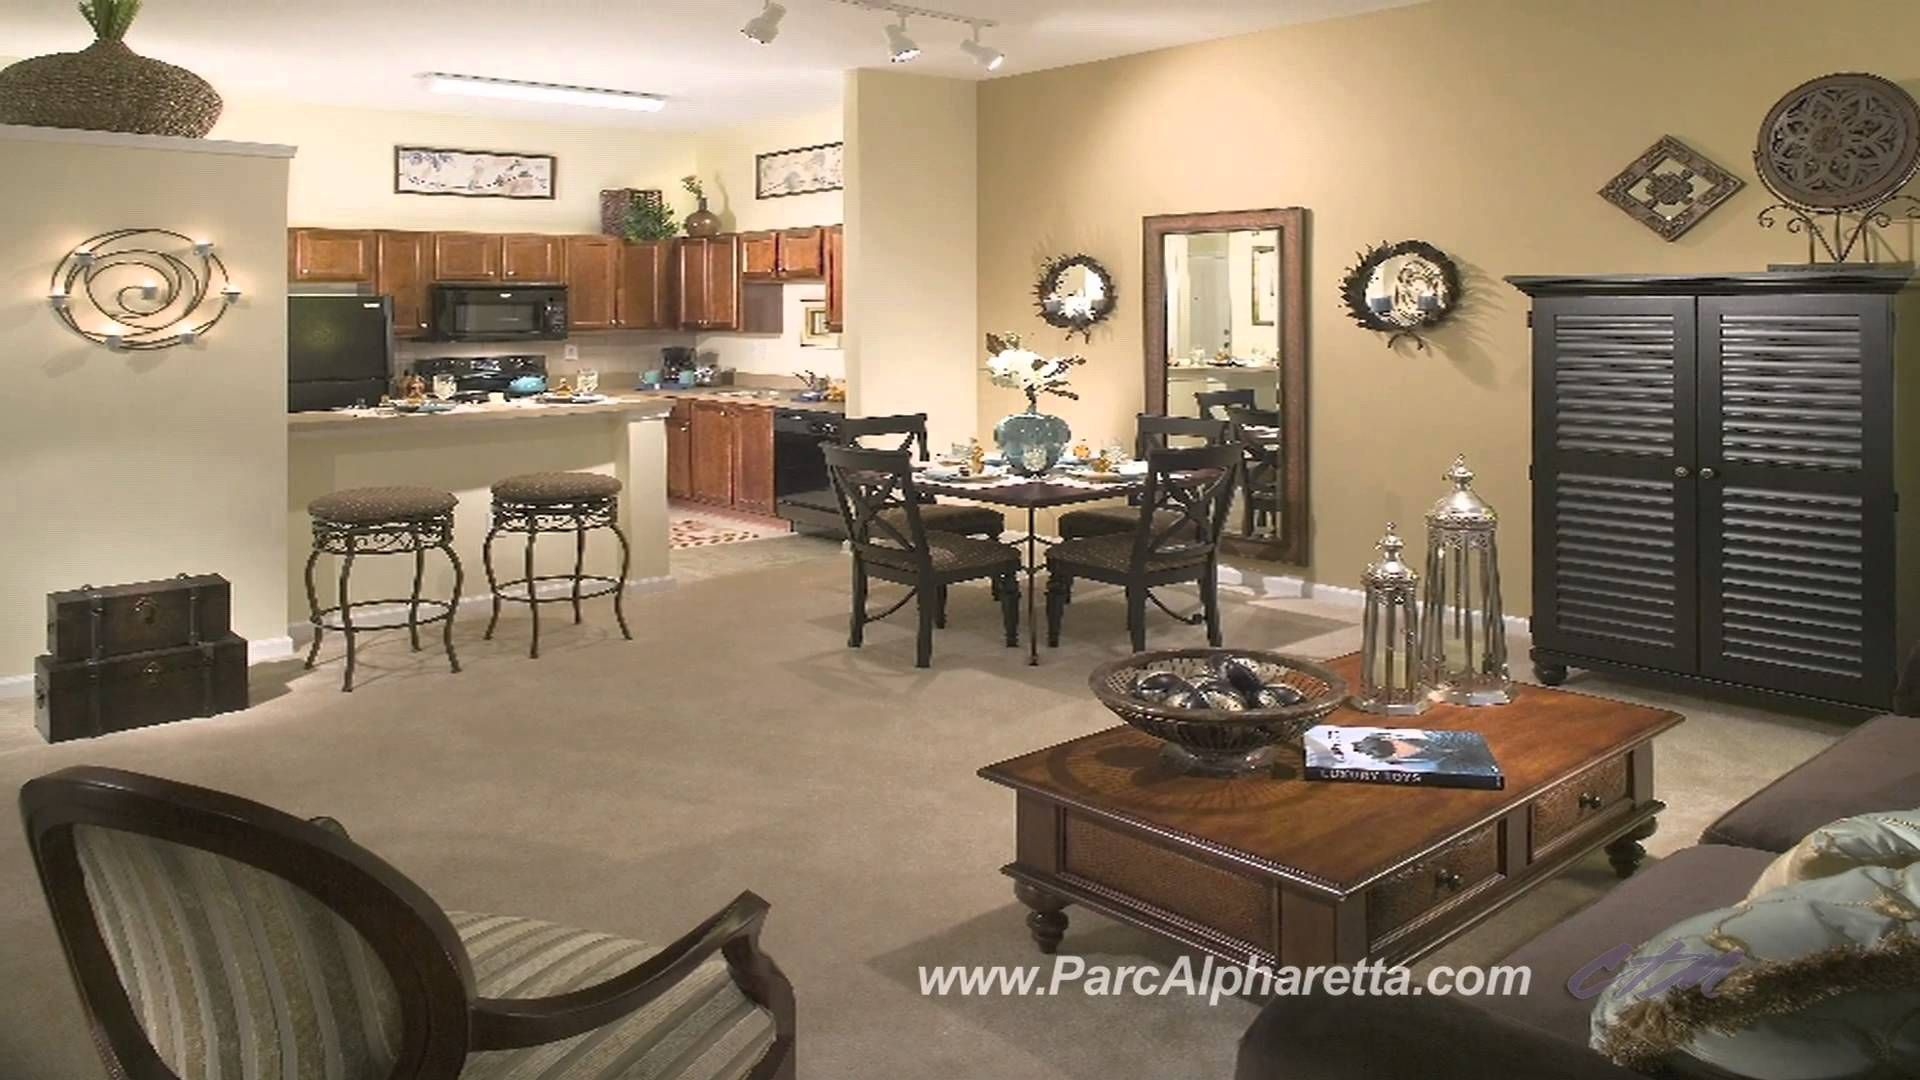 Parc Alpharetta 1 Bedroom Alpharetta Ga Apartments Waterton With Images Apartment Bedroom Home